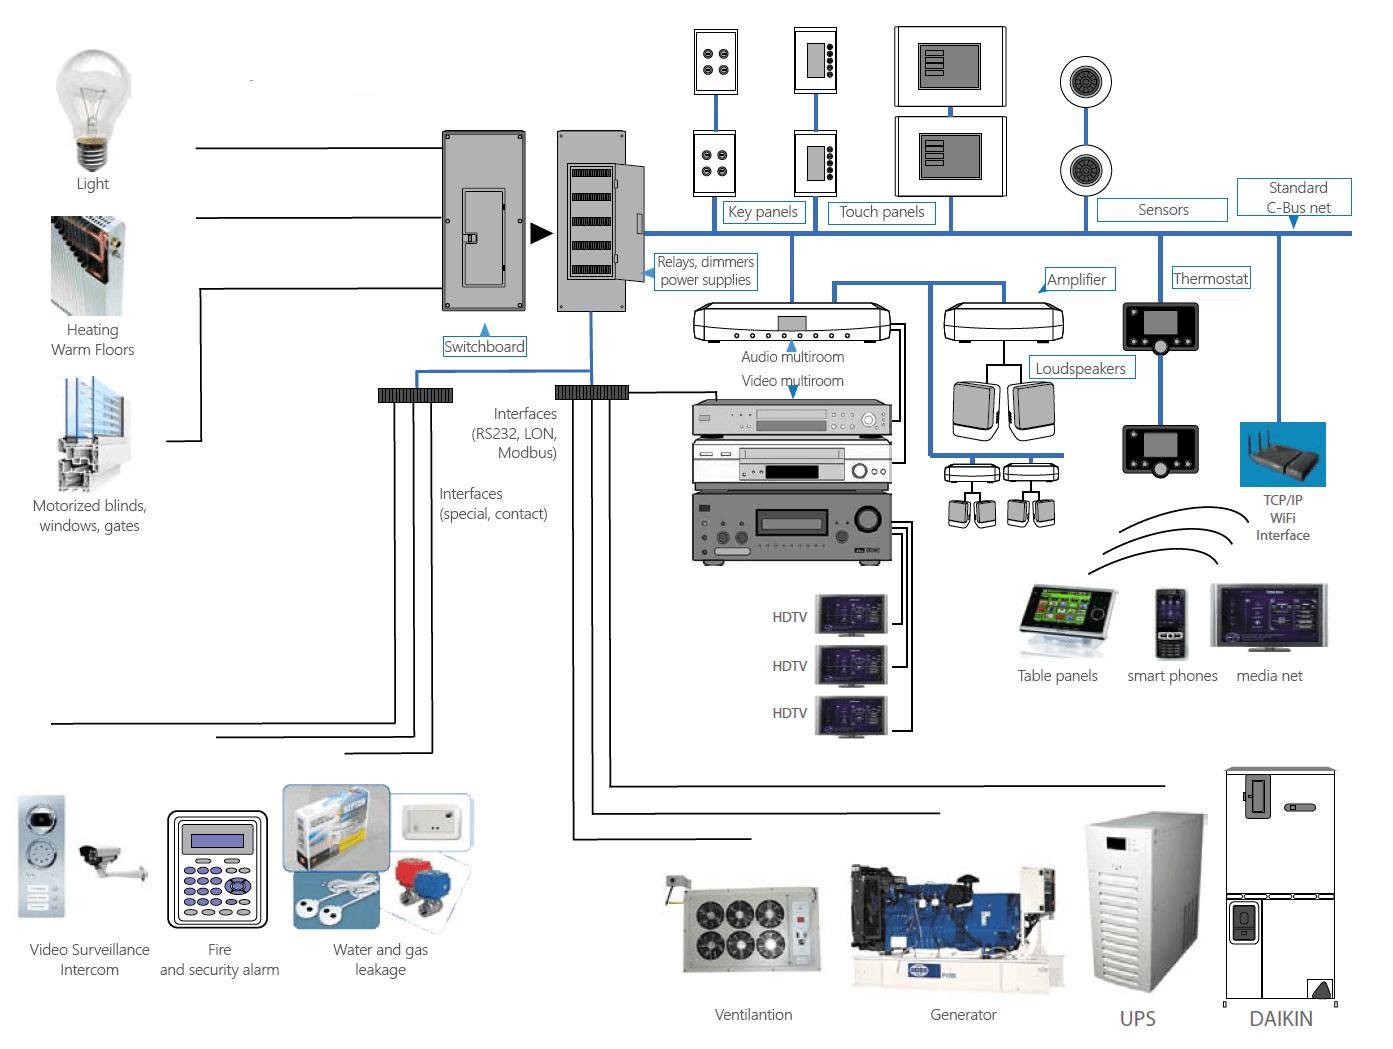 810a4b971f3d49f5b87013b8436f2f55_en-compressor.png